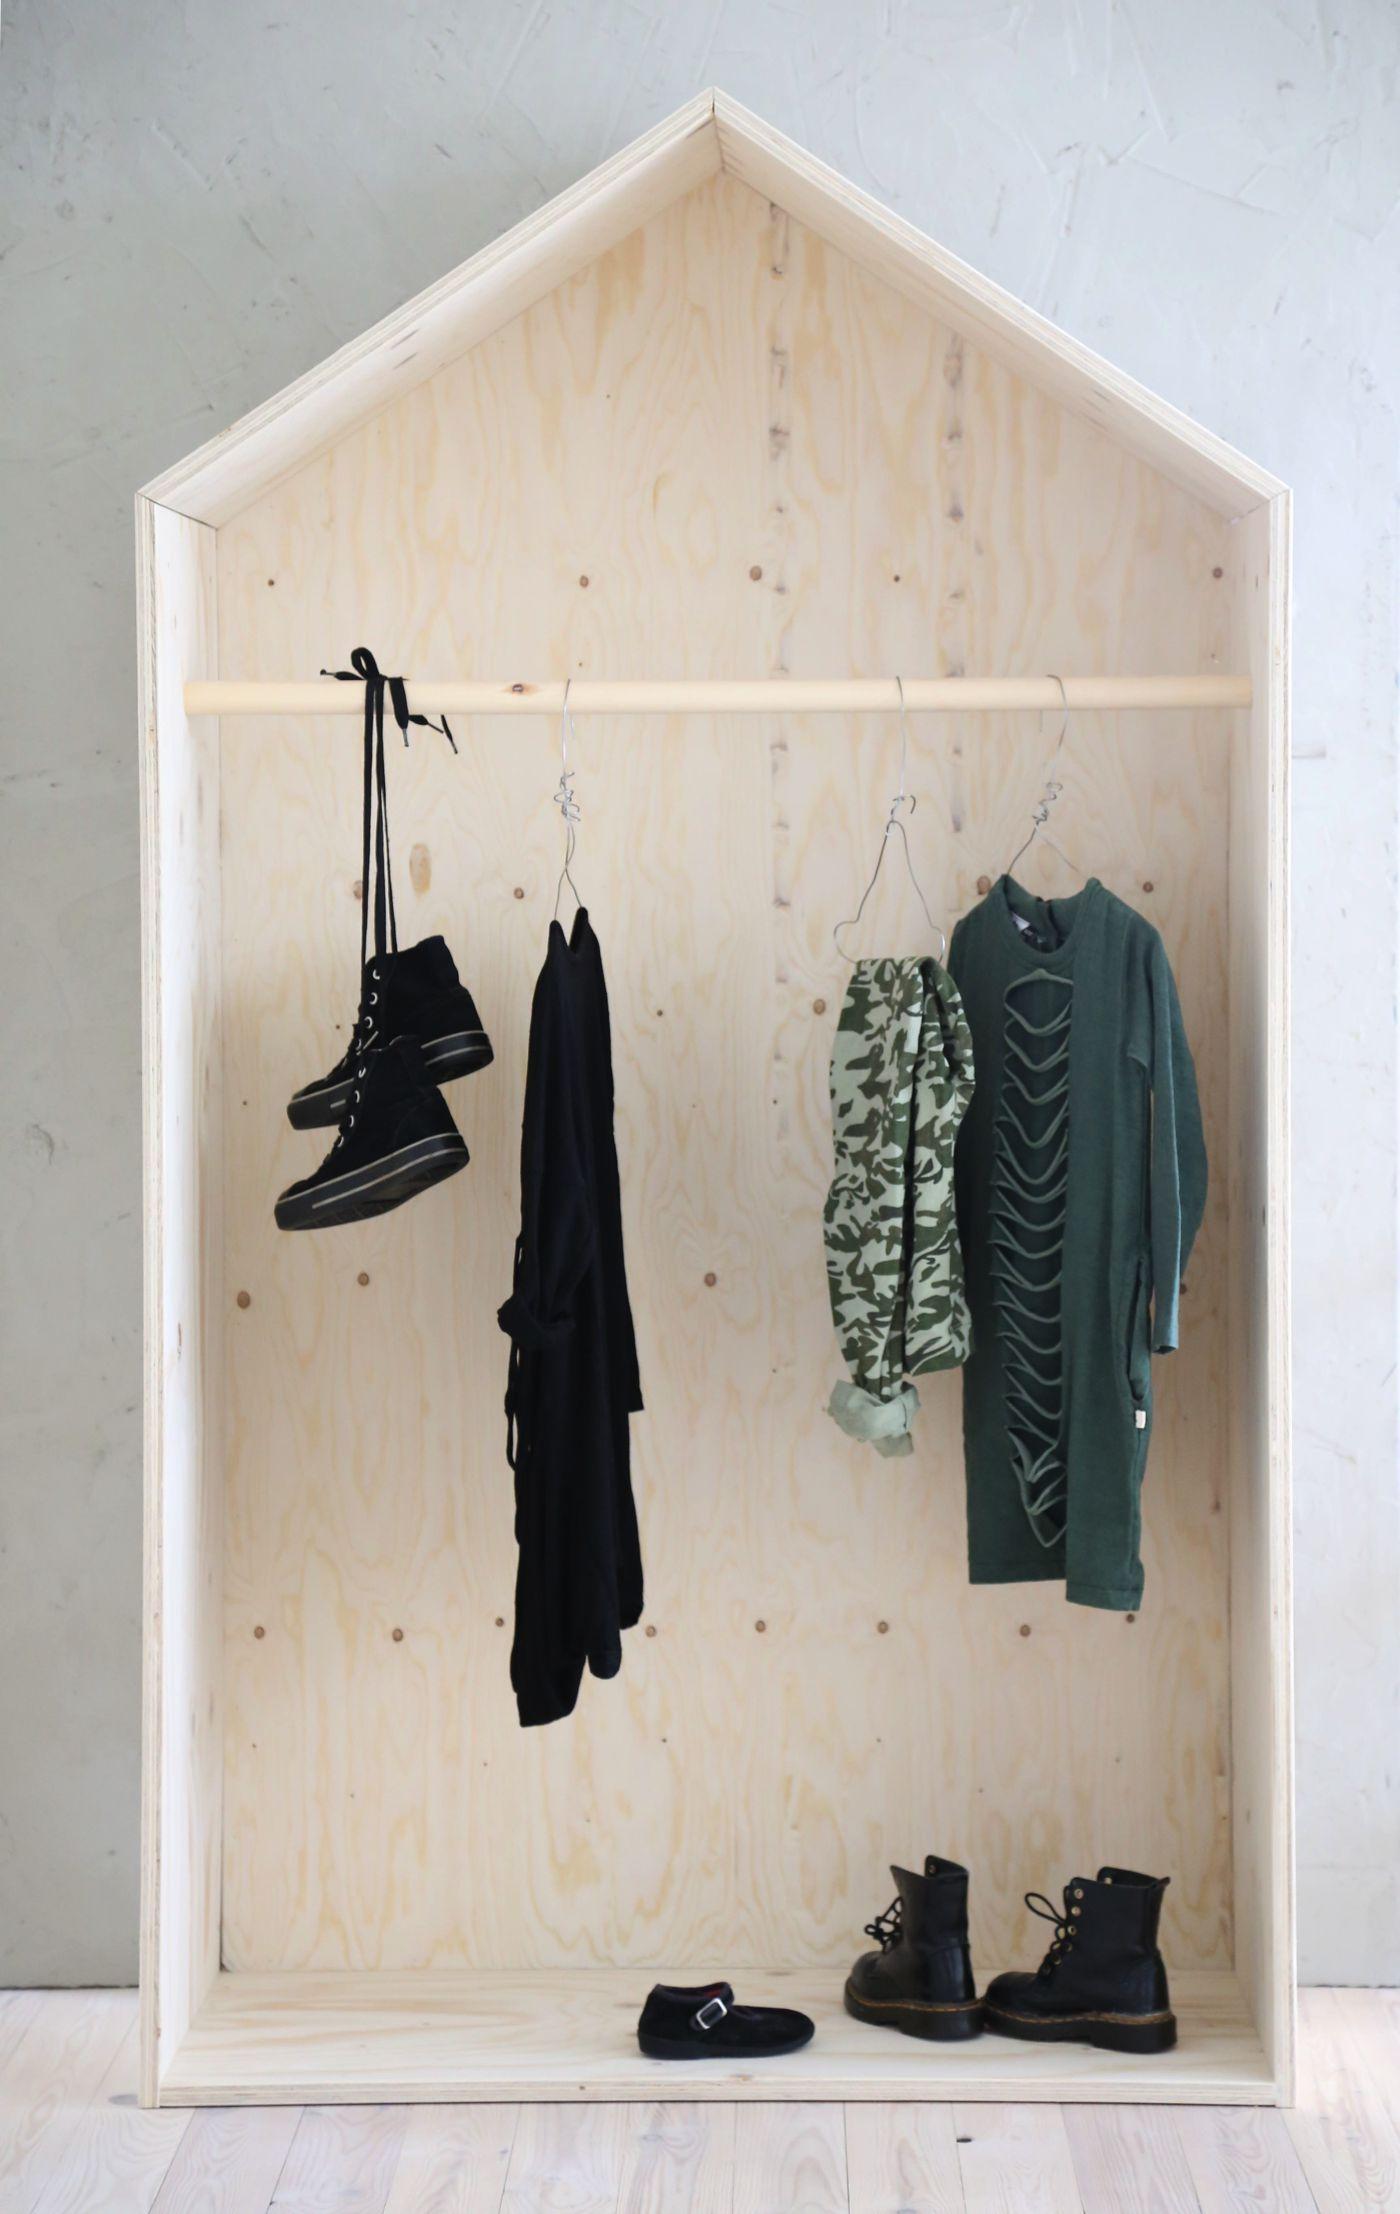 4 fantastically creative wooden shelves and racks (4)